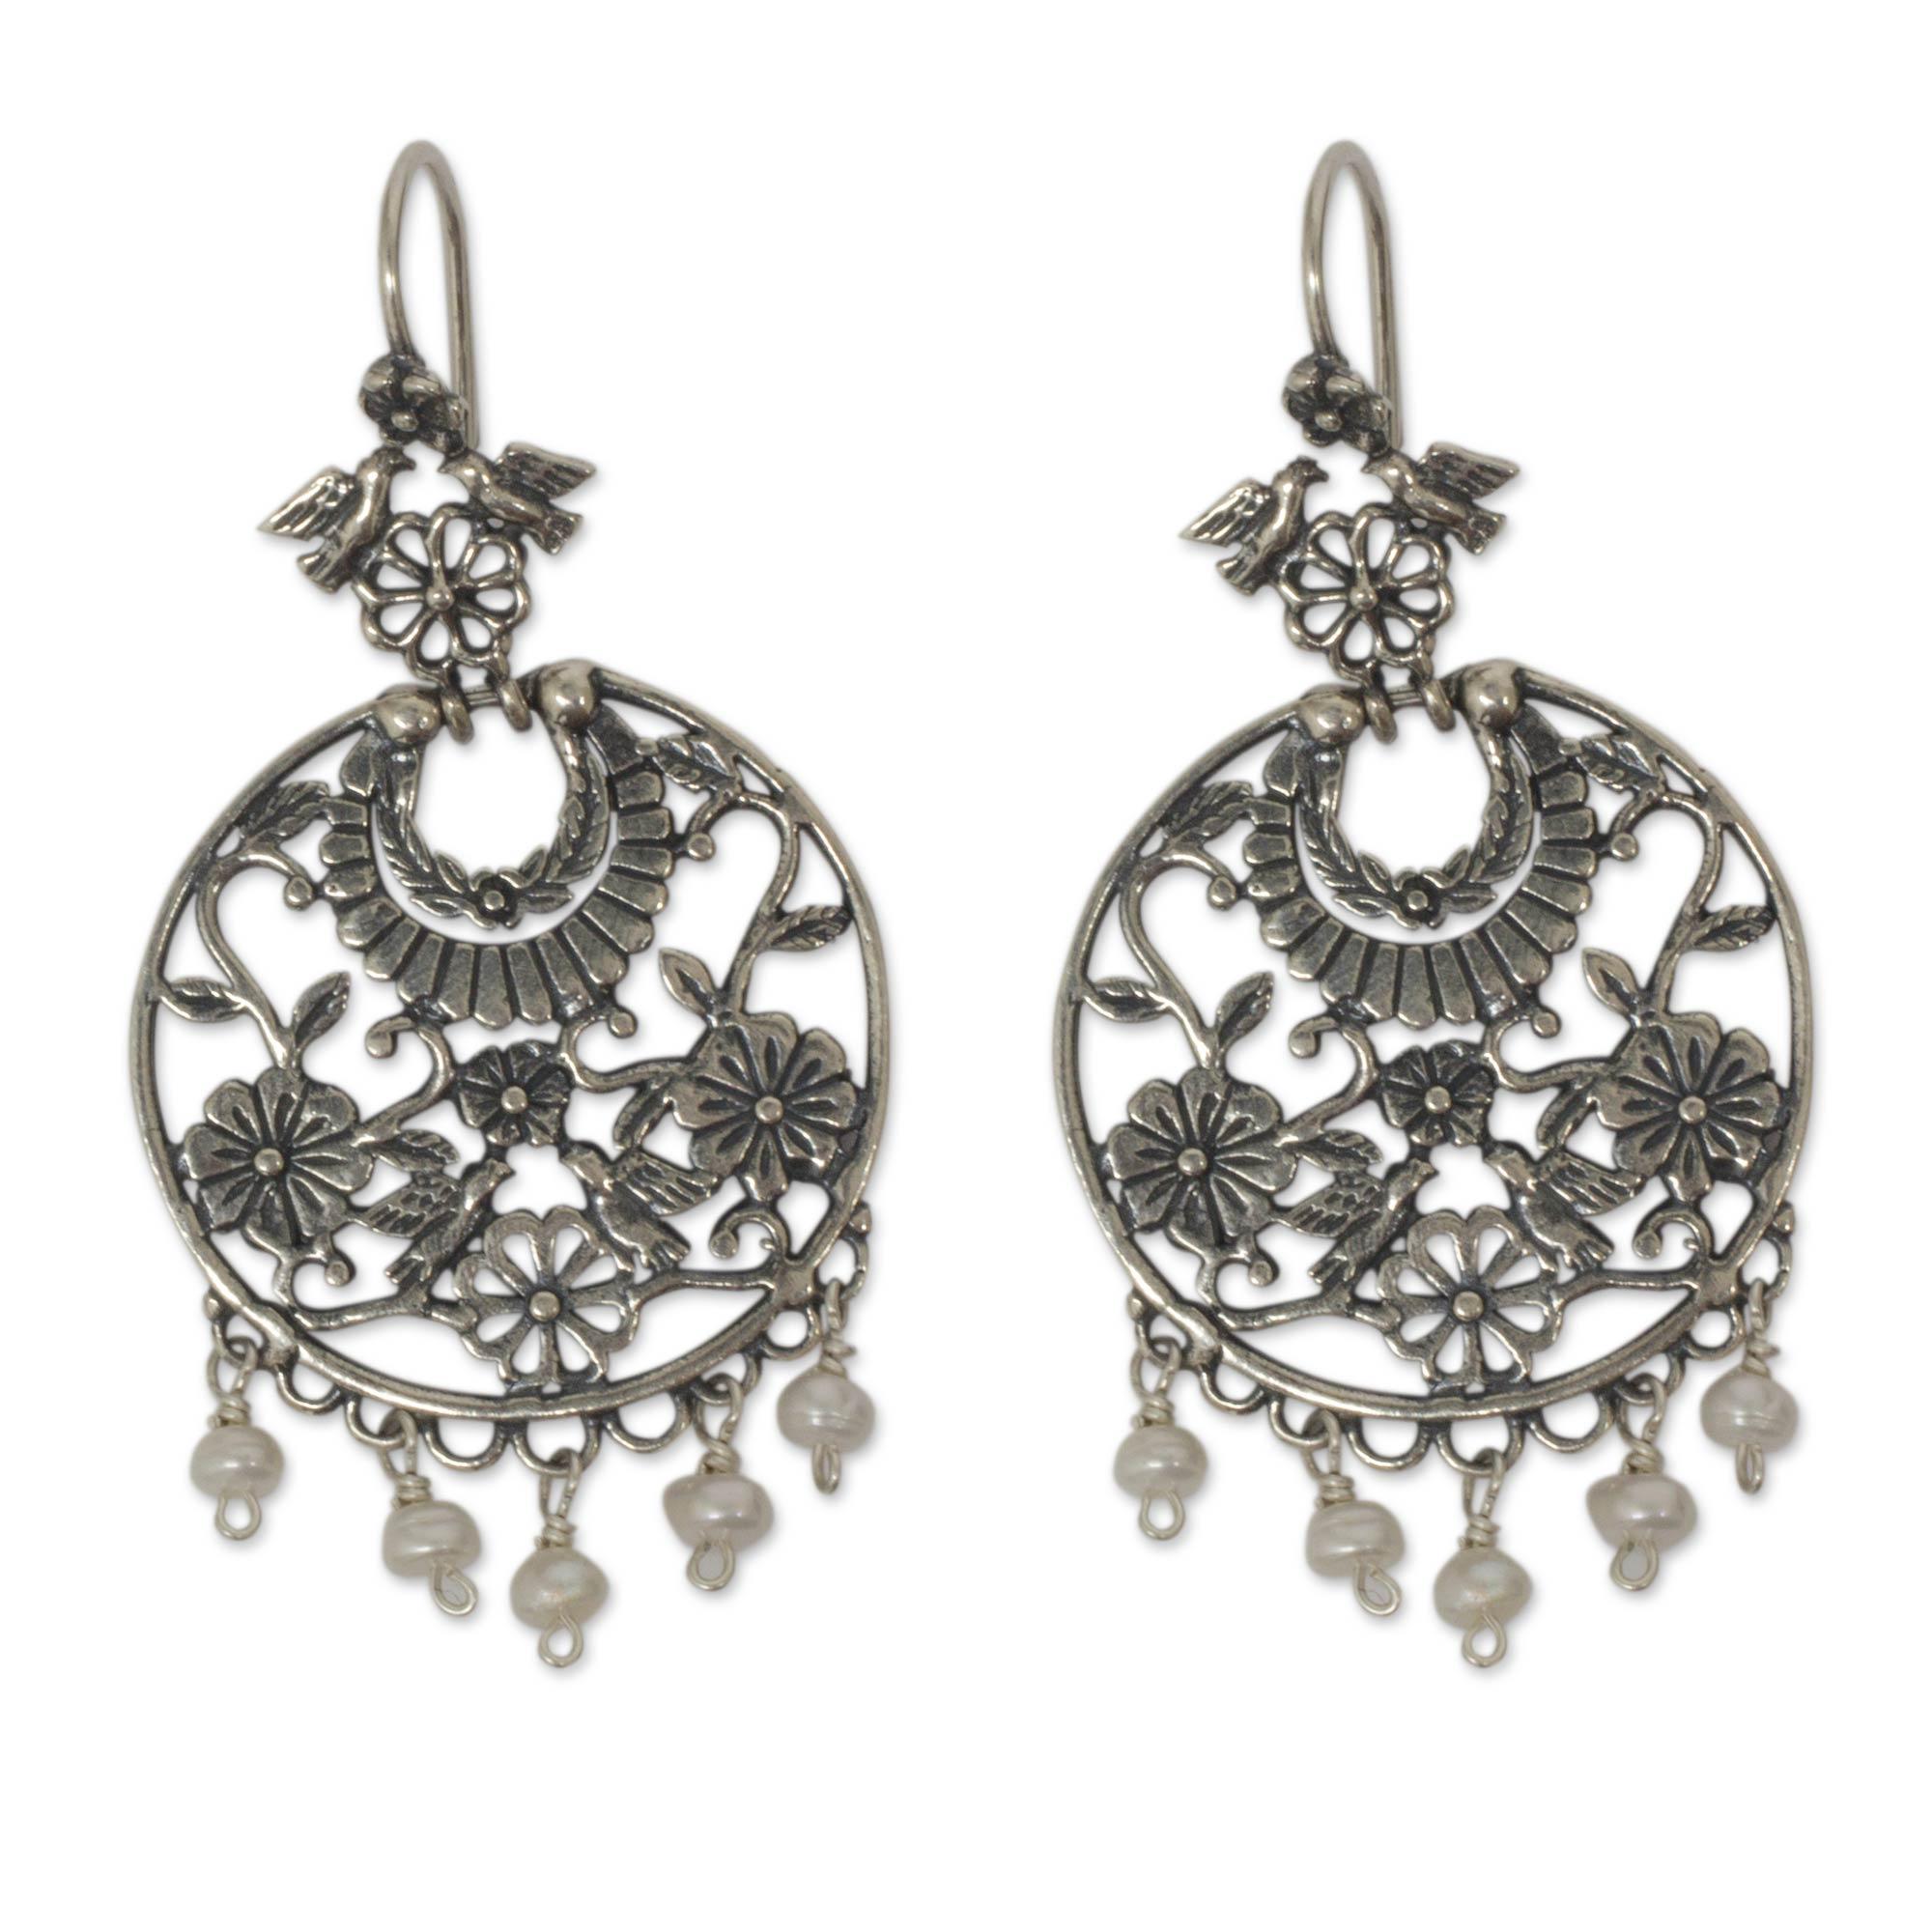 Kiva Antique Style Silver